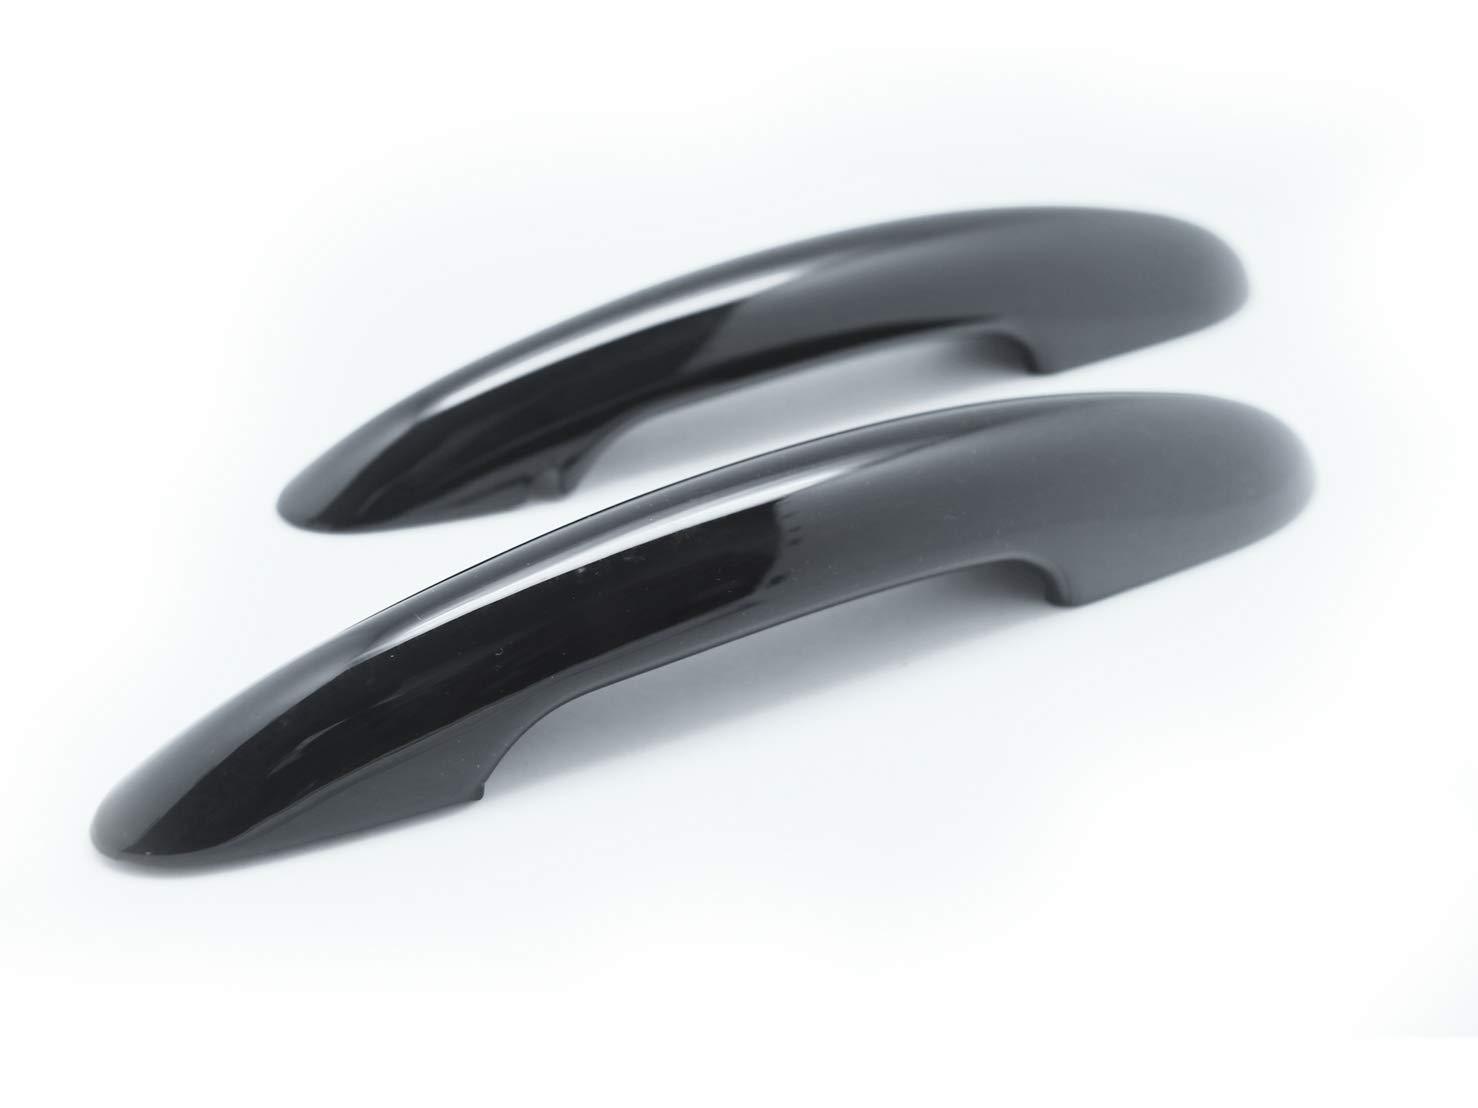 BLACK GLOSSY DOOR HANDLE COVER Fits F54 F55 F56 F58 F59 2 CarLab